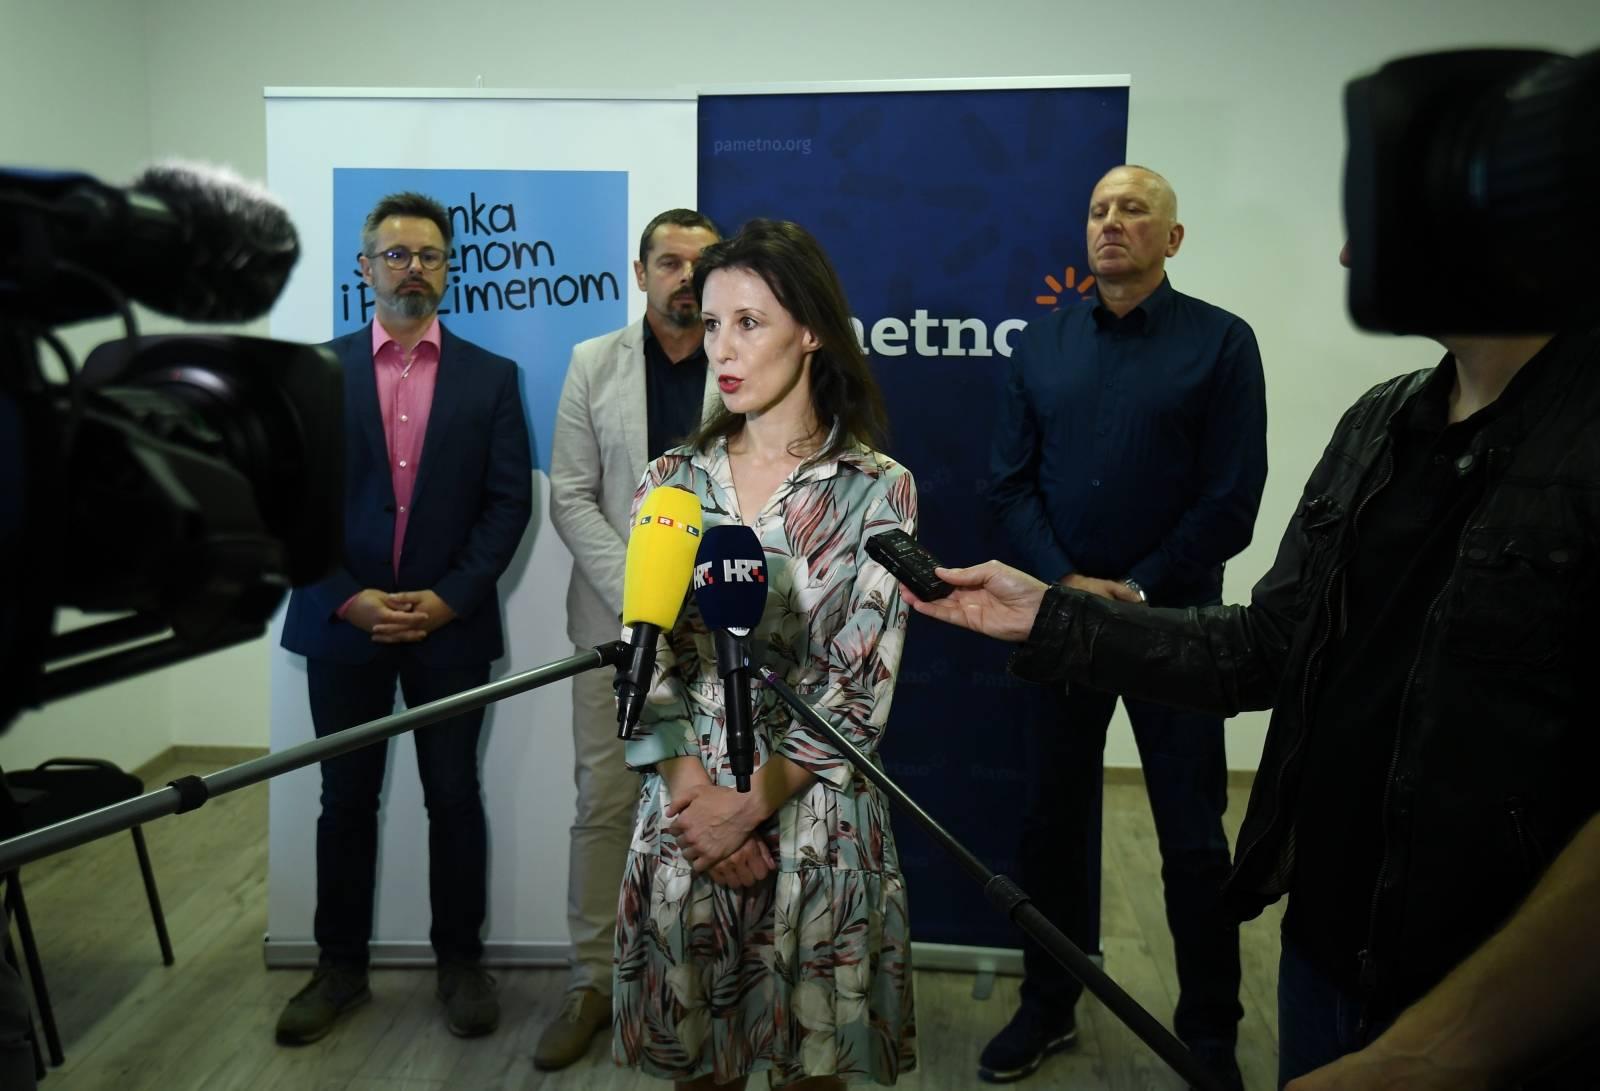 Zagreb: Konferencija za medije koalicije Stranke s imenom i prezimenom, Pametno i Fokus